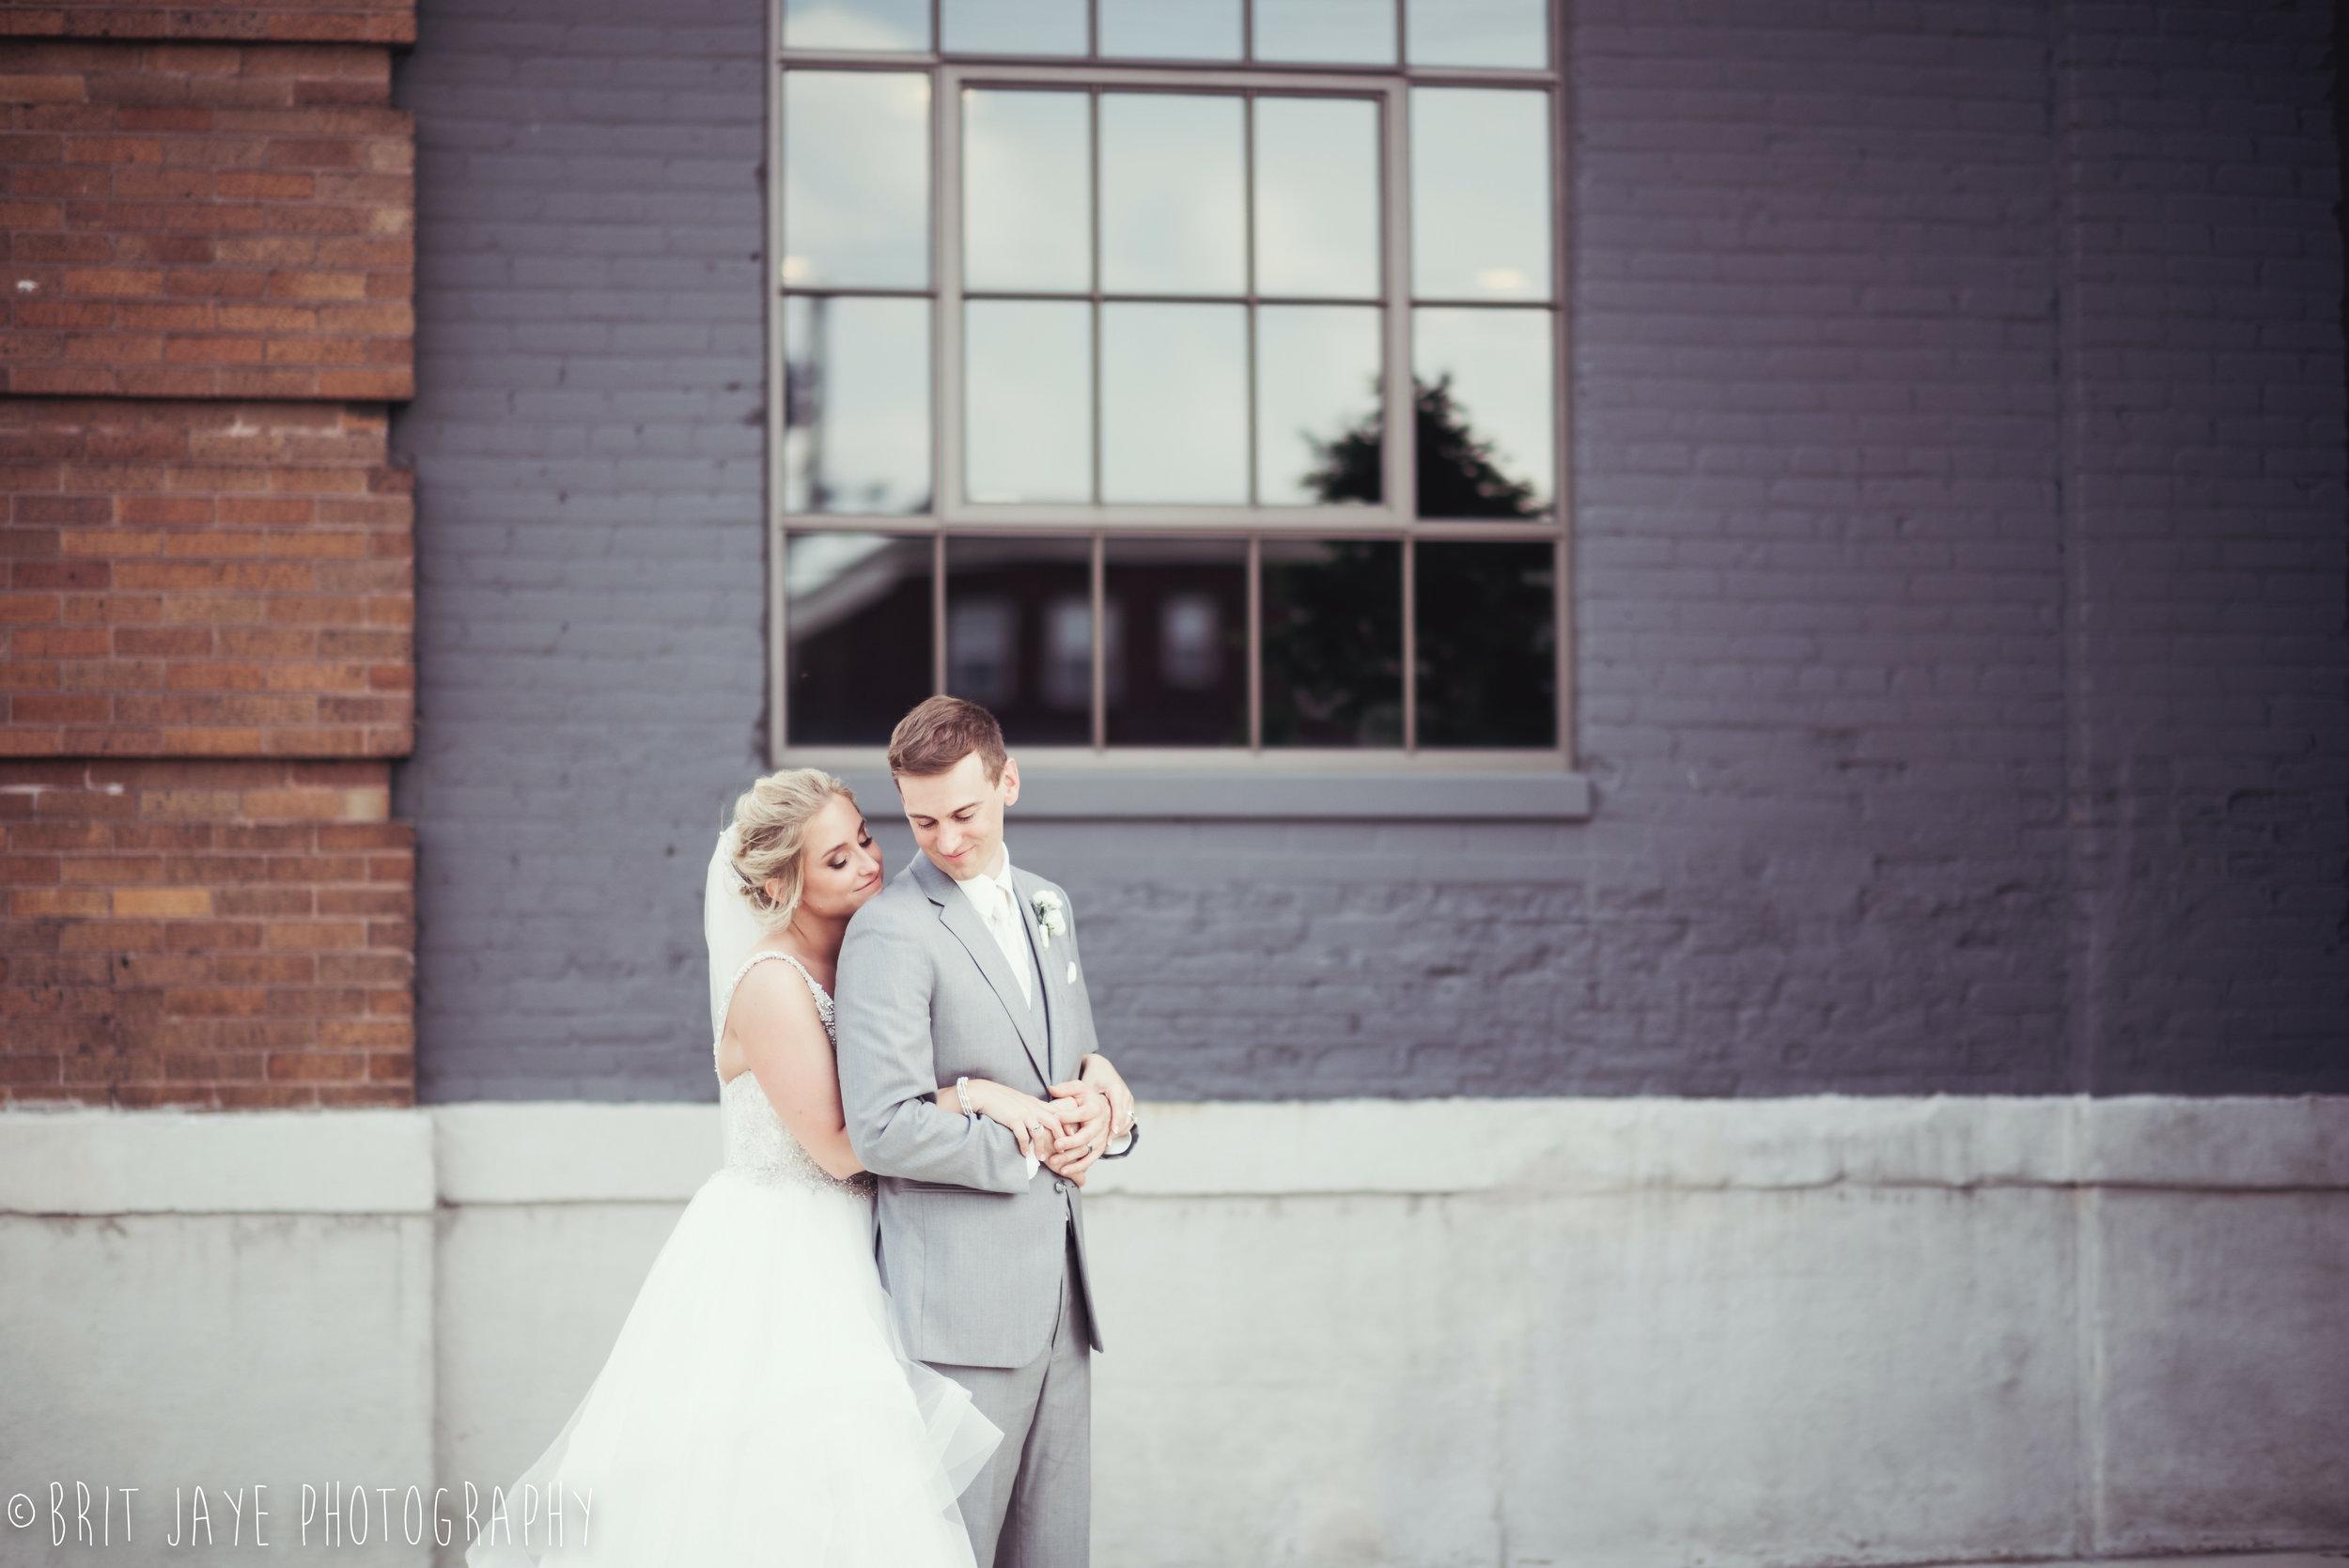 Spring_Wedding_at_Steam_Plant_Dayton-1-3.jpg